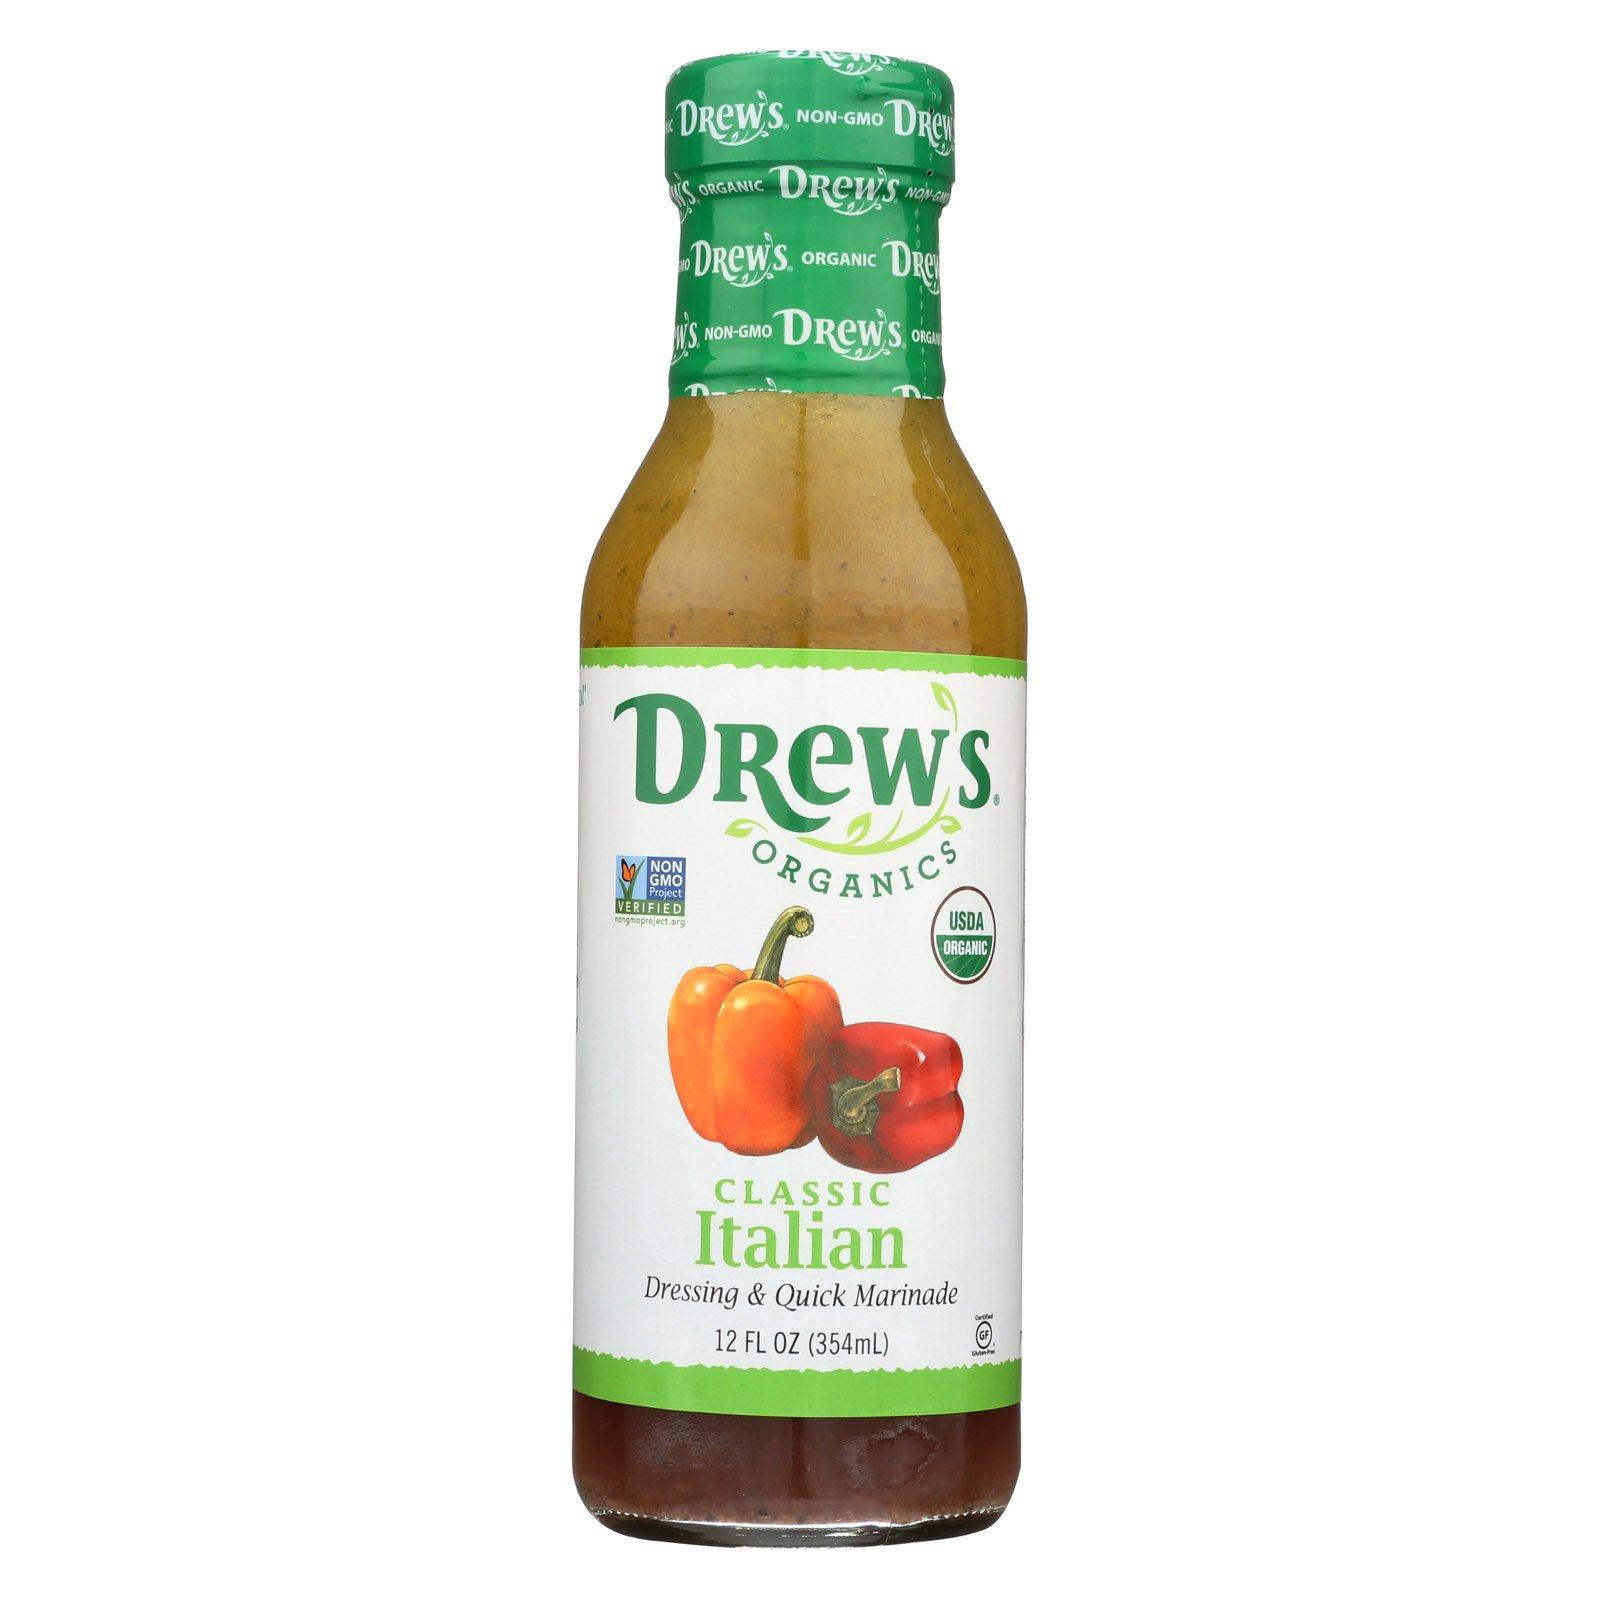 Drew's Organics Organic Dressing and Quick Marinade - Classic Italian - 12 Fl. Oz. - Case of 6